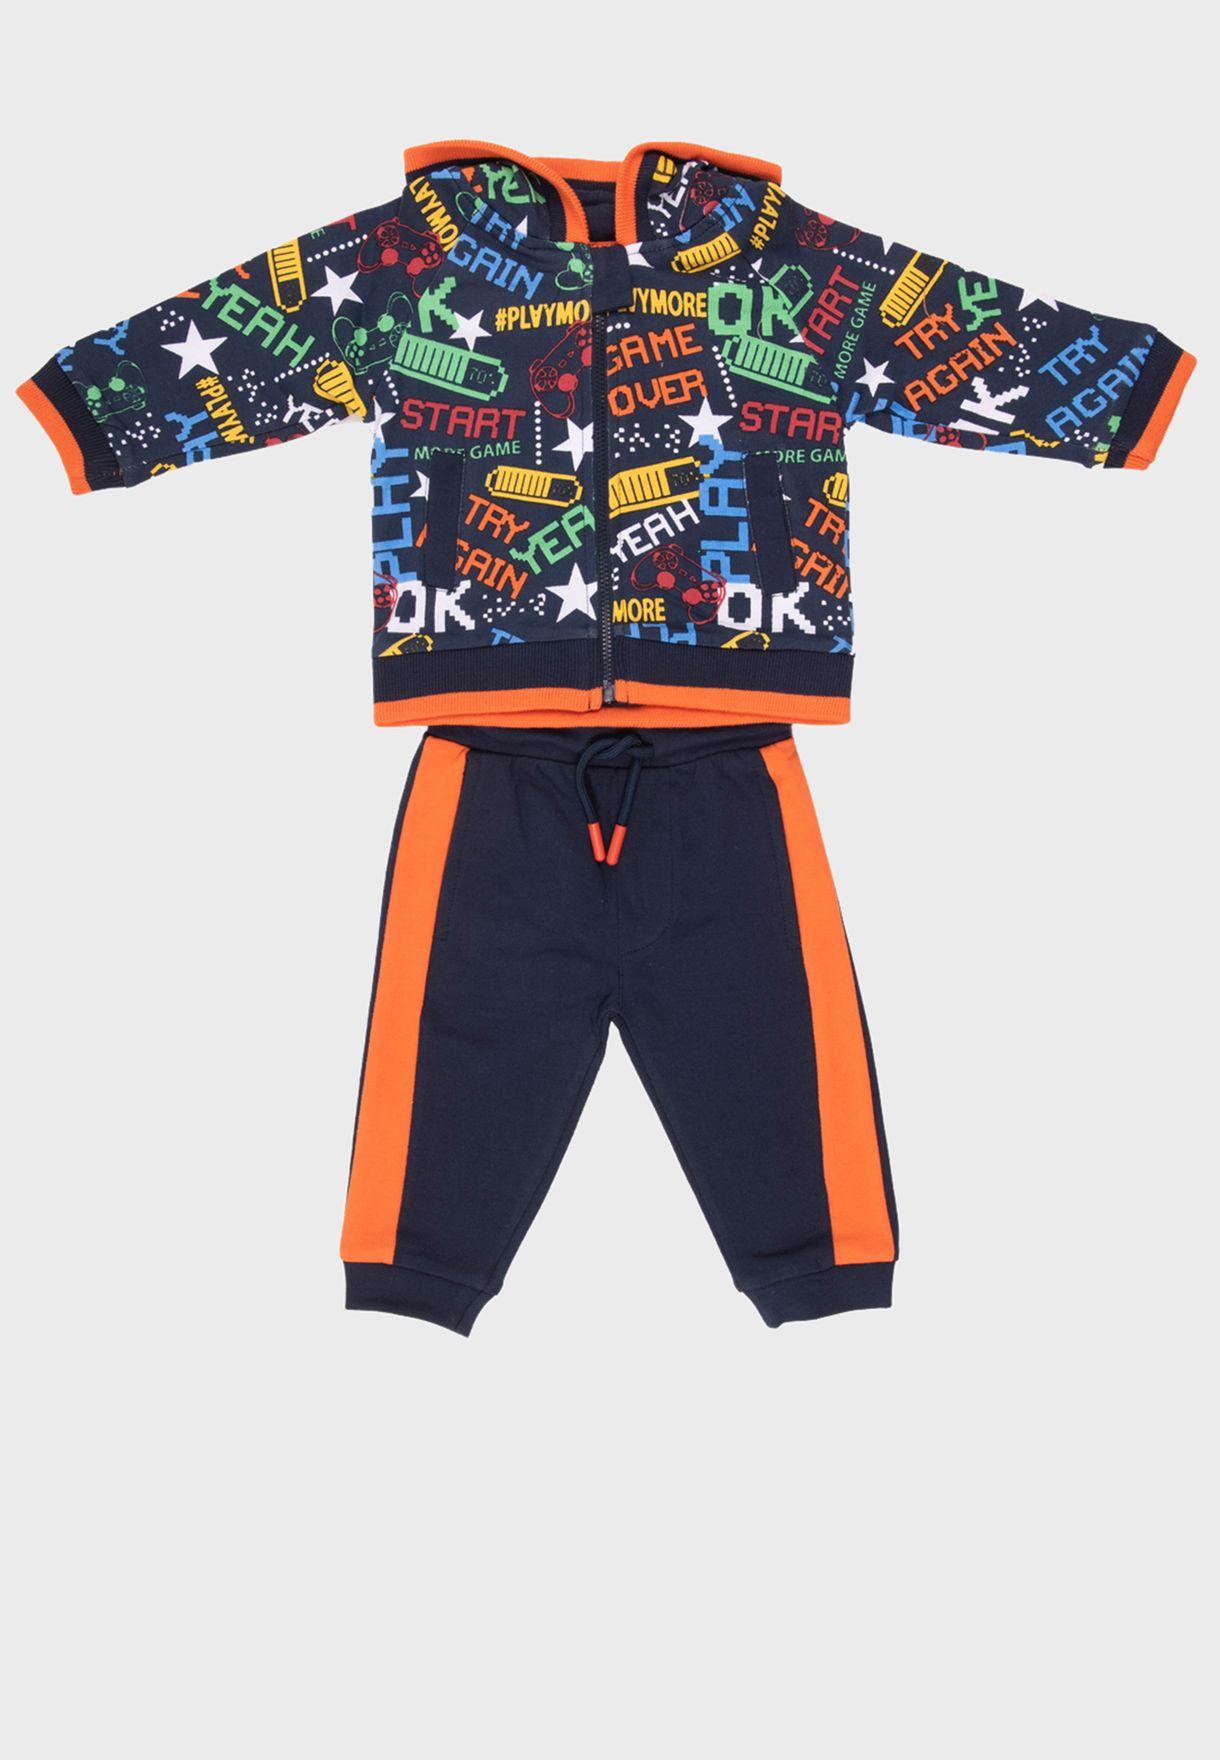 Kids Graphic T-Shirt + Sweatpants Set